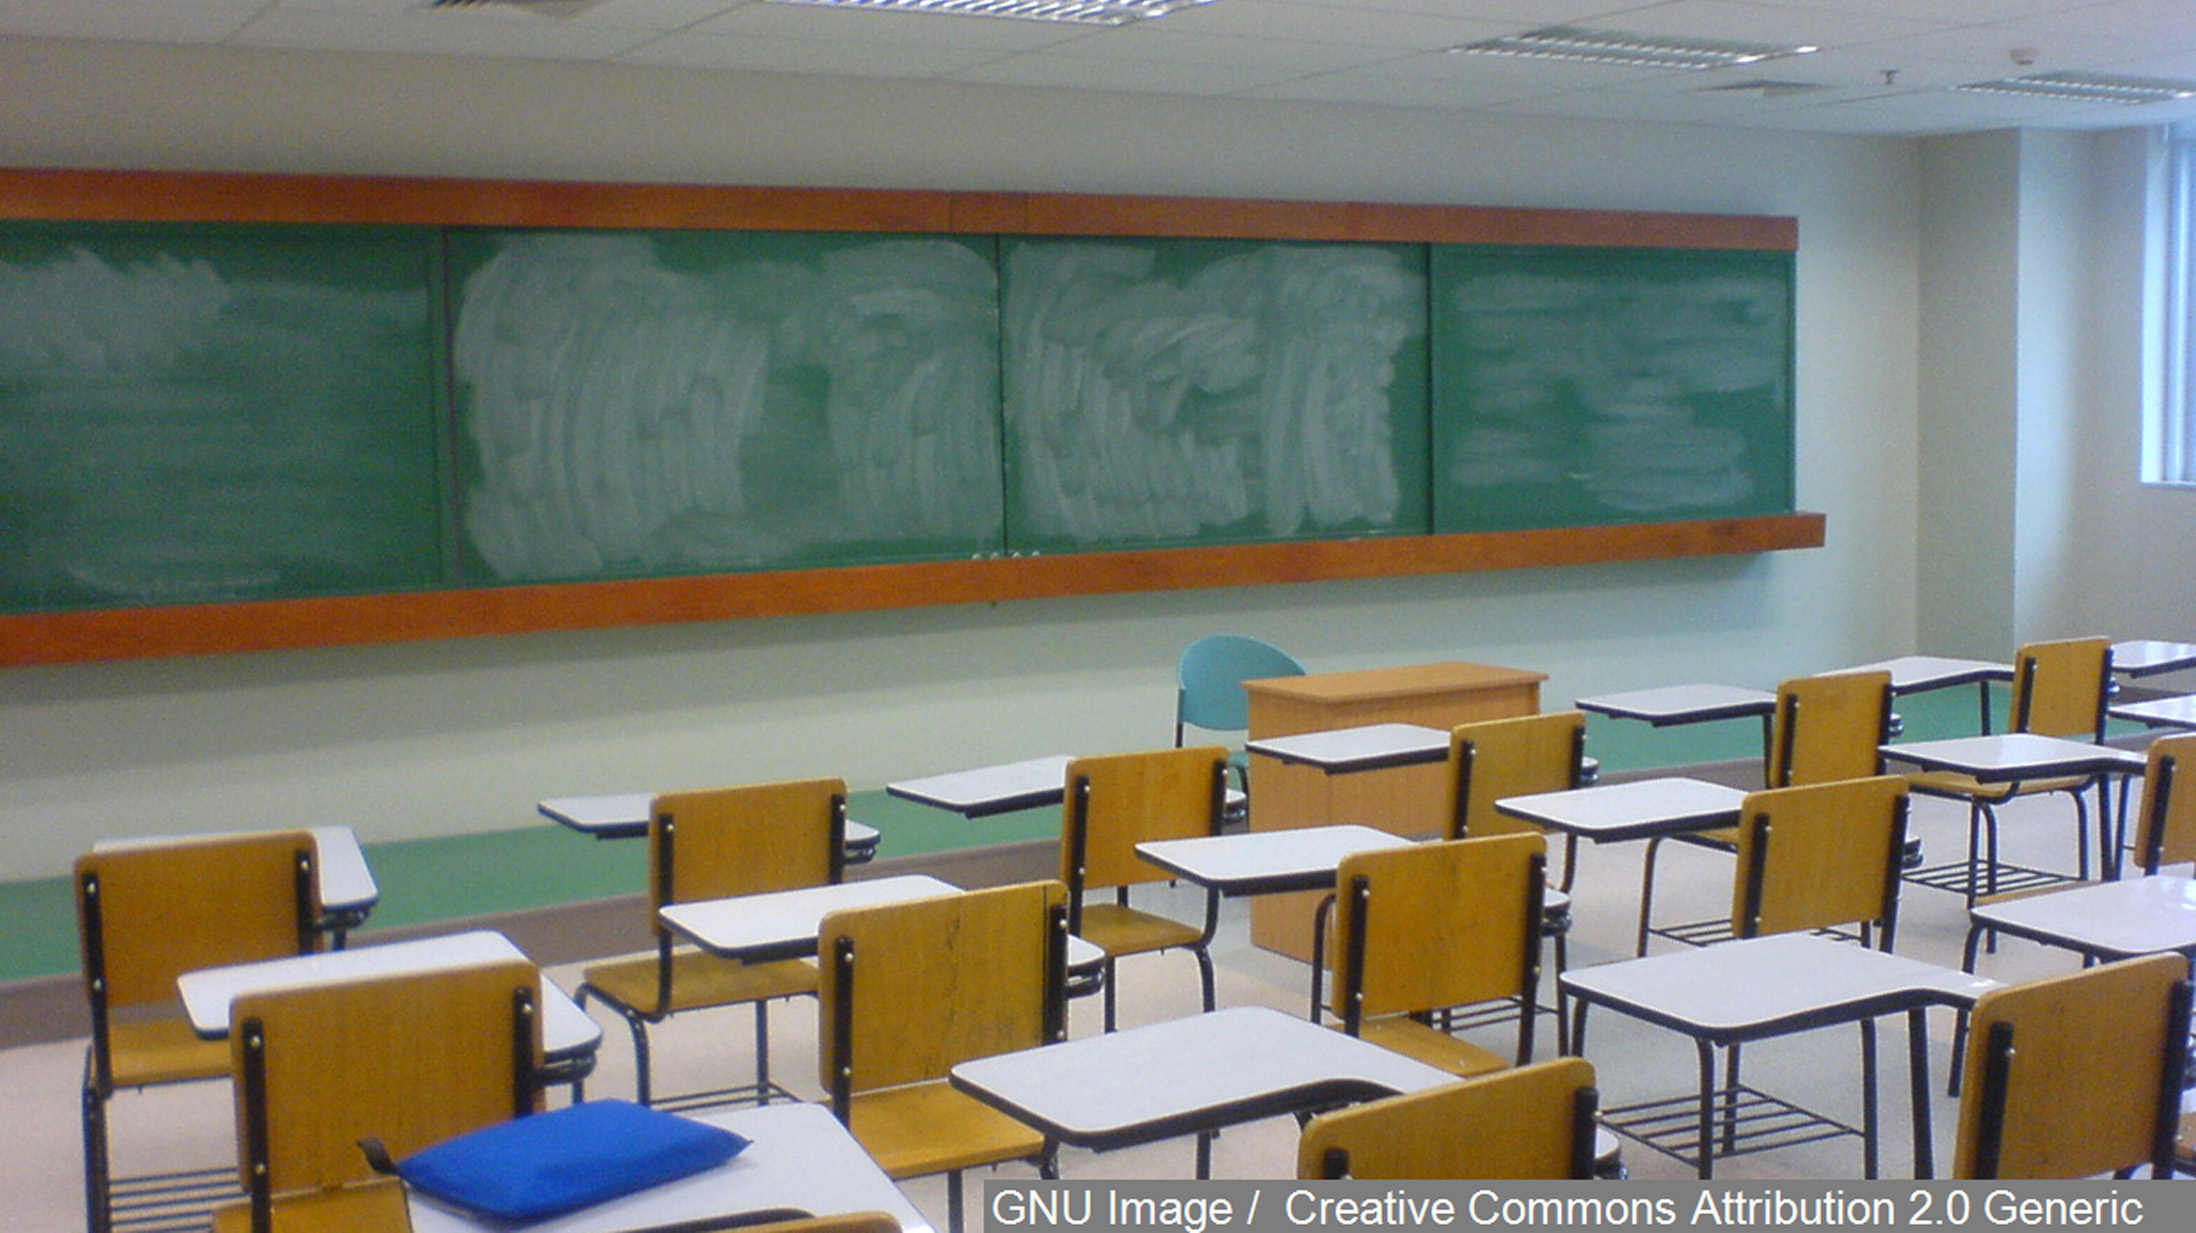 Classroom 10122015_1456887162702.jpg